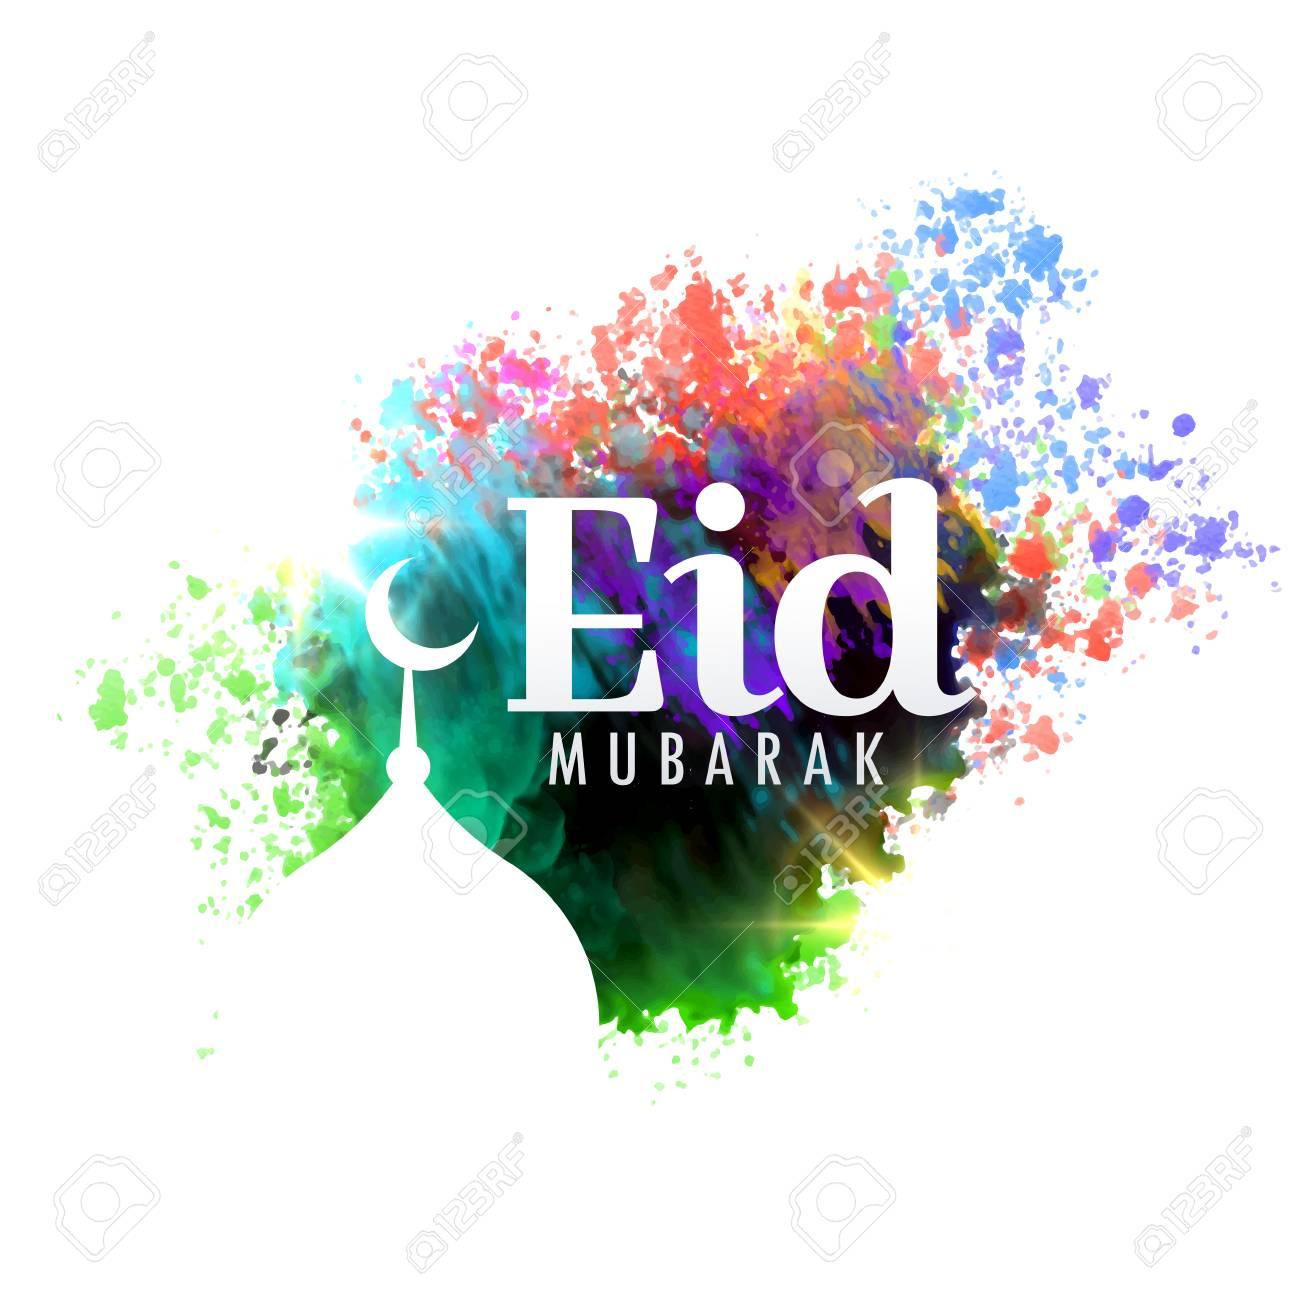 Eid mubarak festival greeting card design with watercolor effect eid mubarak festival greeting card design with watercolor effect stock vector 78021840 m4hsunfo